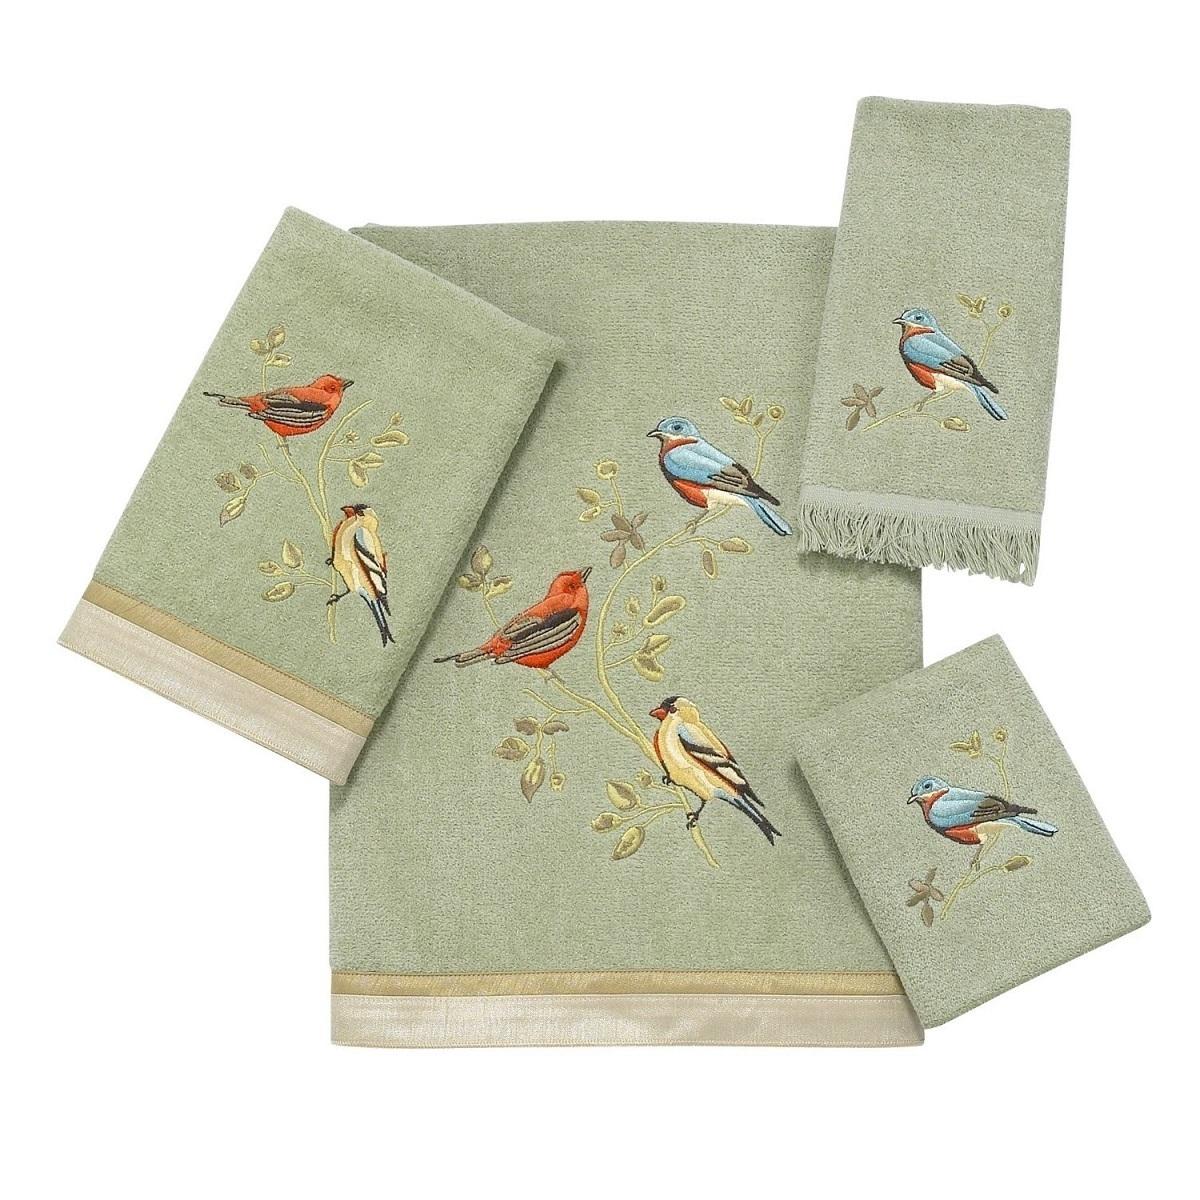 Полотенца Полотенце 69х127 Avanti Gilded Birds зеленое elitnoe-polotentse-mahrovoe-gilded-birds-zelyonoe-ot-avanti-kanada-nabor.jpg